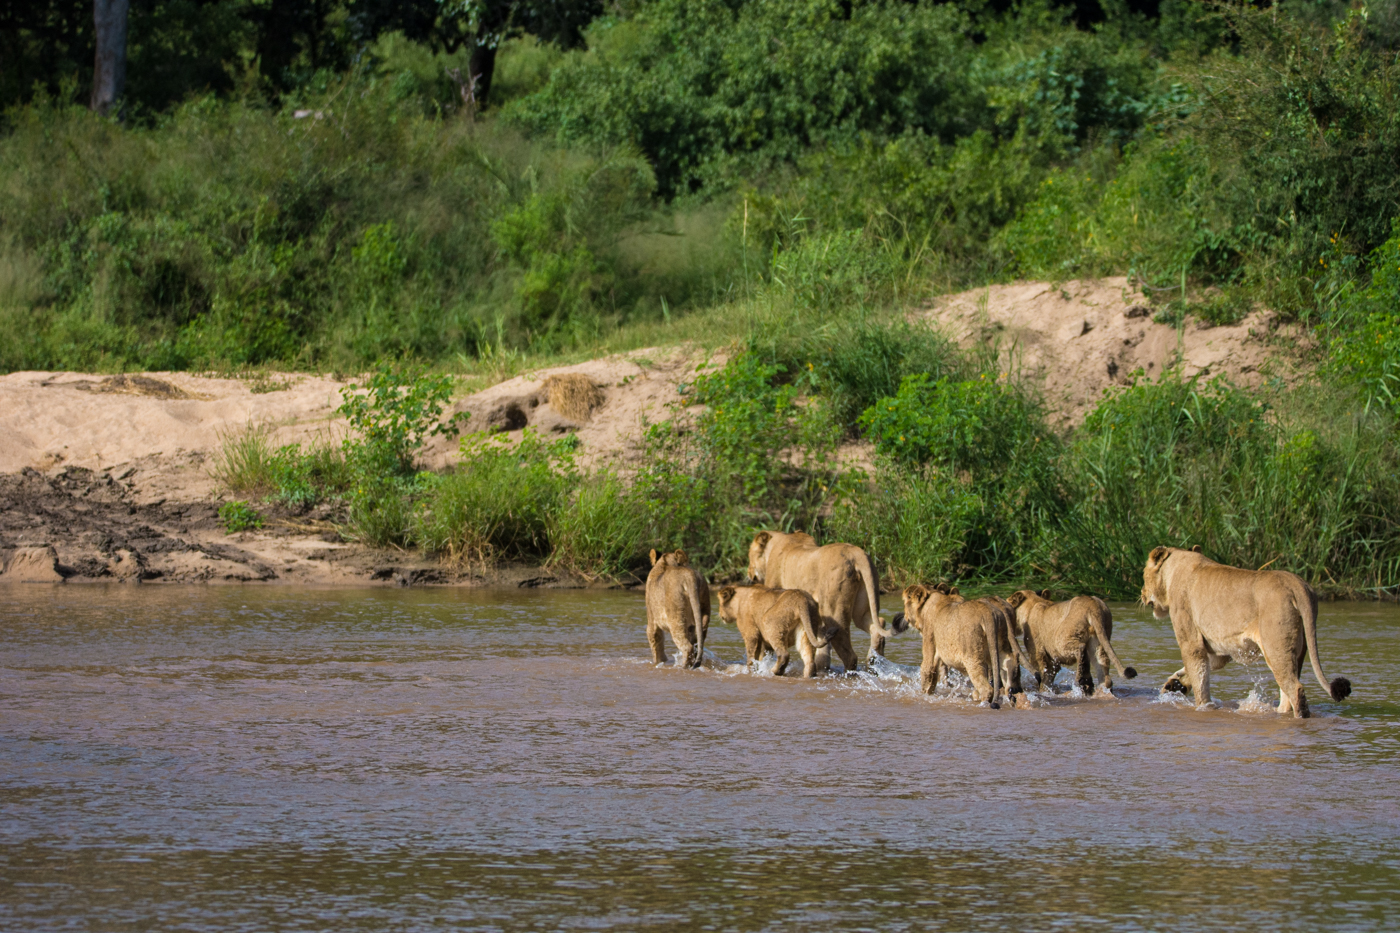 tsalala pride crossing river